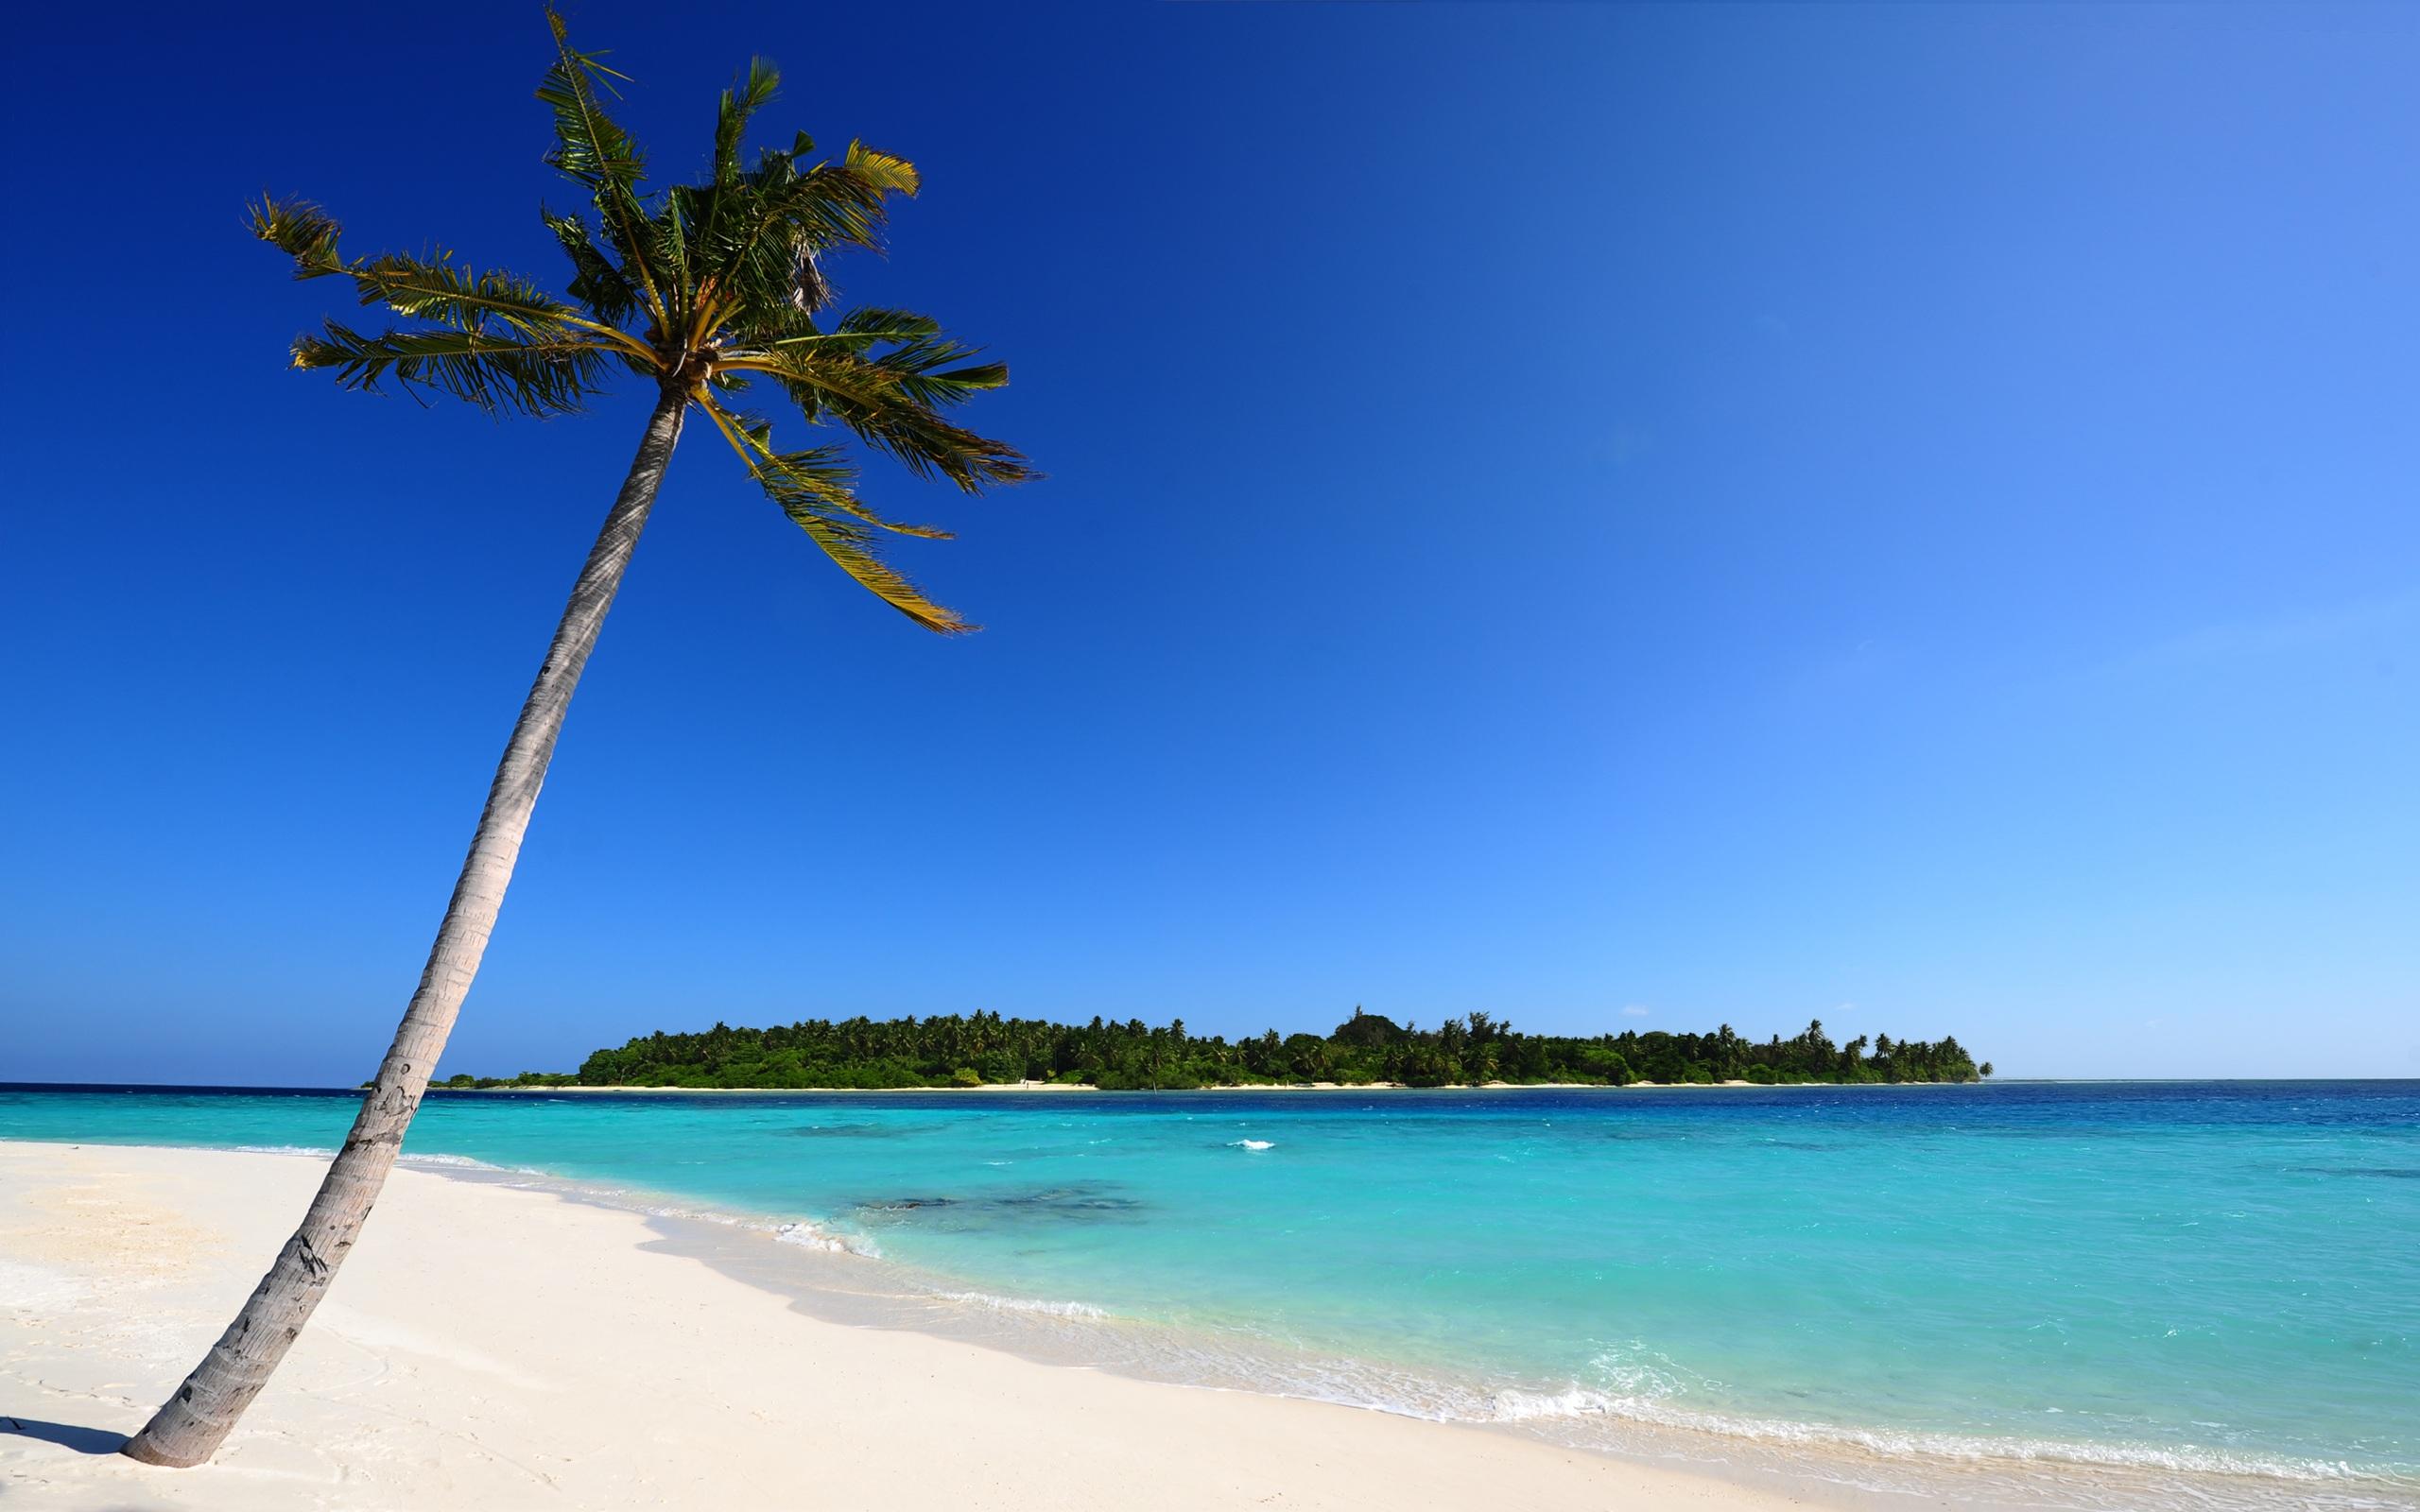 palm-tree-beach-island-blue-ocean-sand_095462.jpg